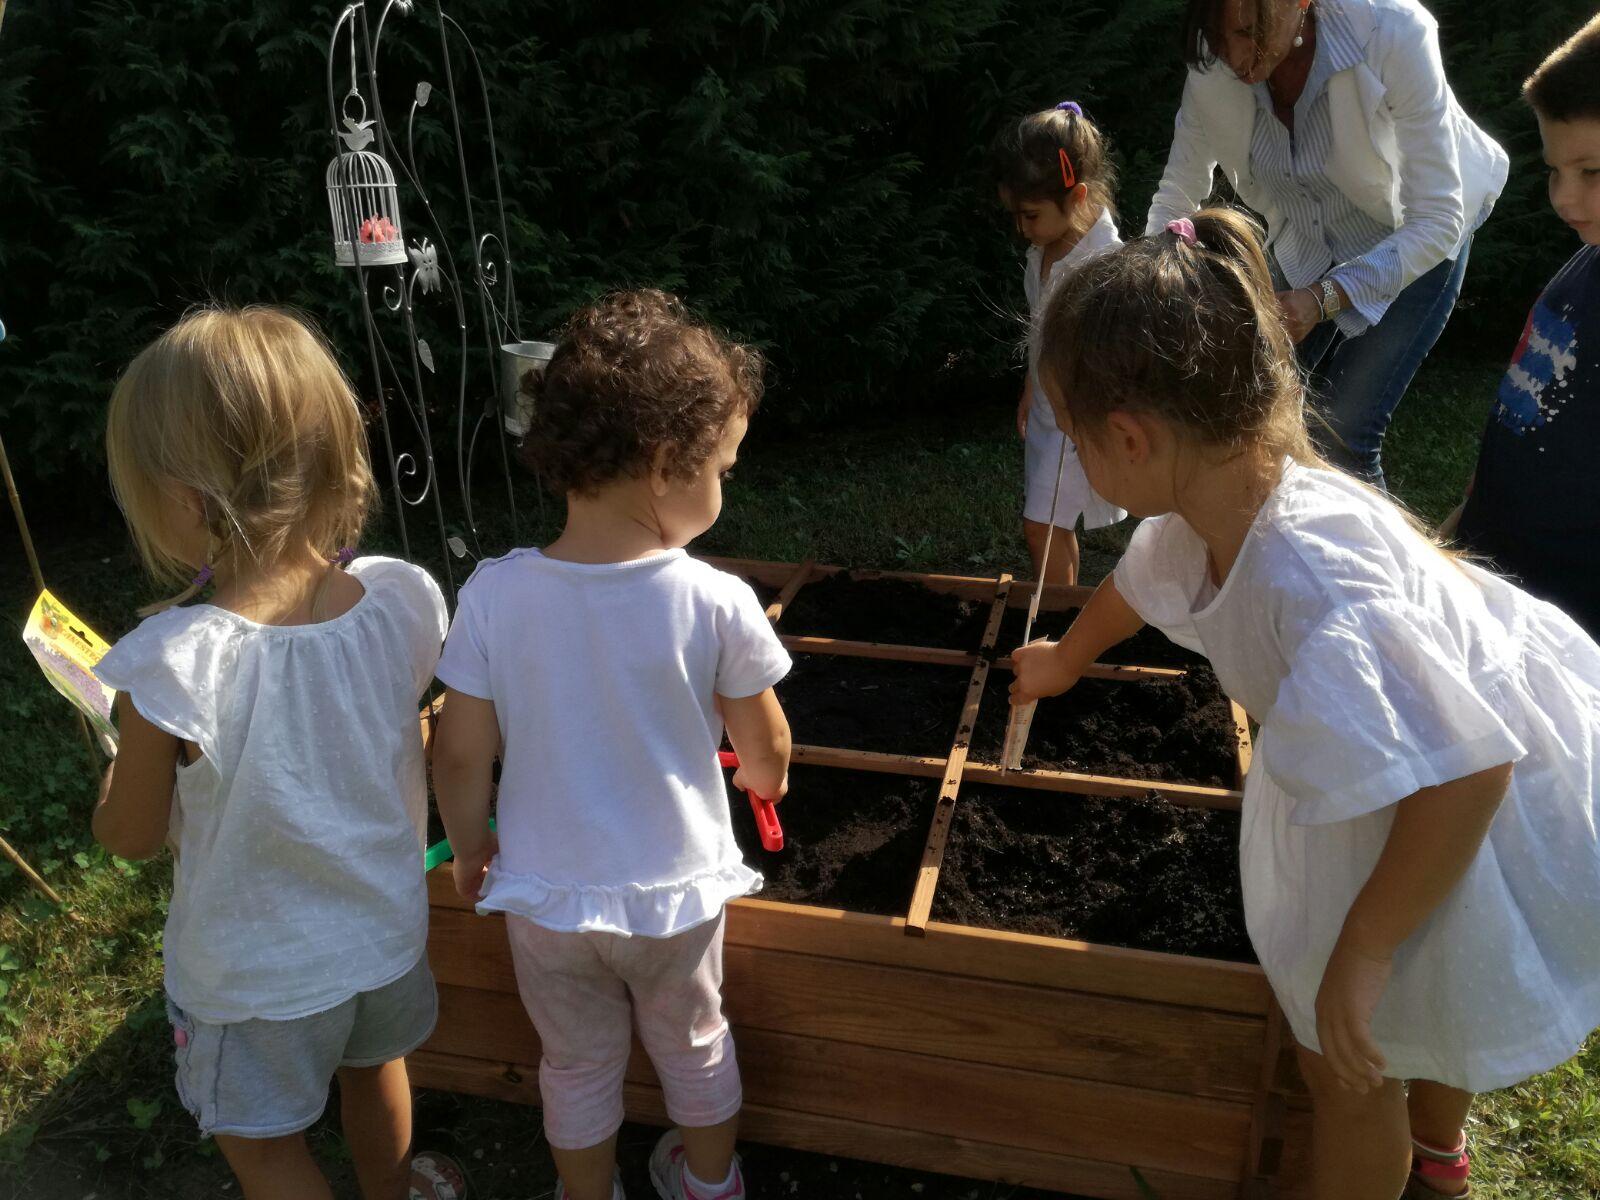 Bambini giocano in giardino